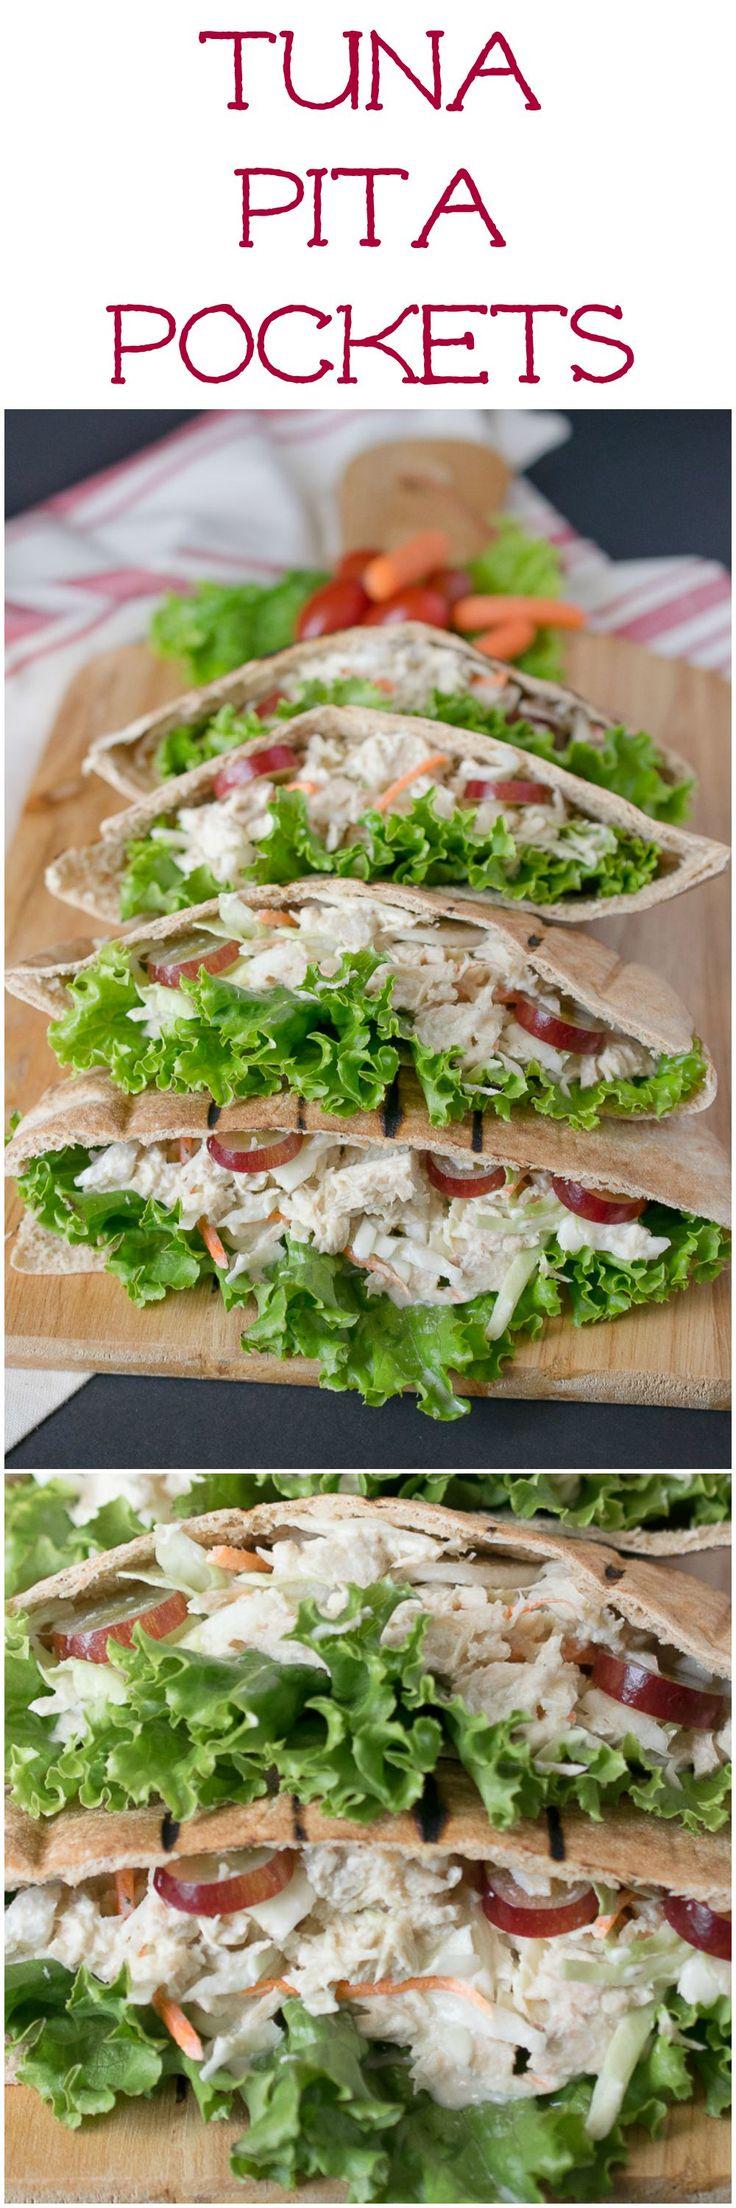 Tuna pita pockets - Quick dinner idea for weeknights. By @culinaryginger #bumblebee